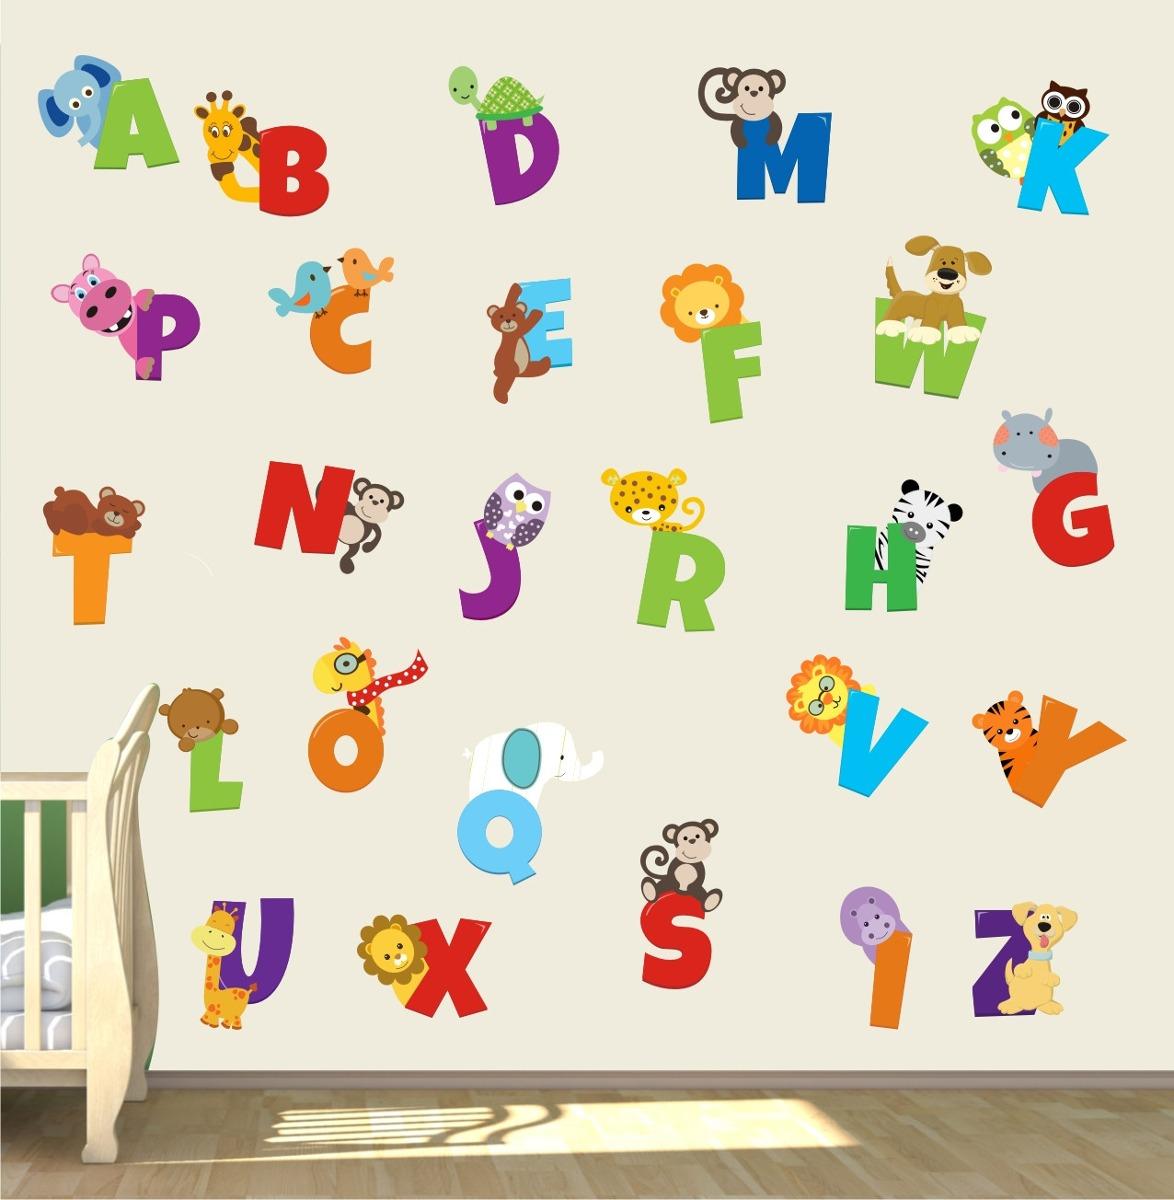 Artesanato Feltro Materiais ~ Adesivo Infantil Letras Alfabeto Girafa Leao Safari Zoo M101 R$ 148,00 em Mercado Livre